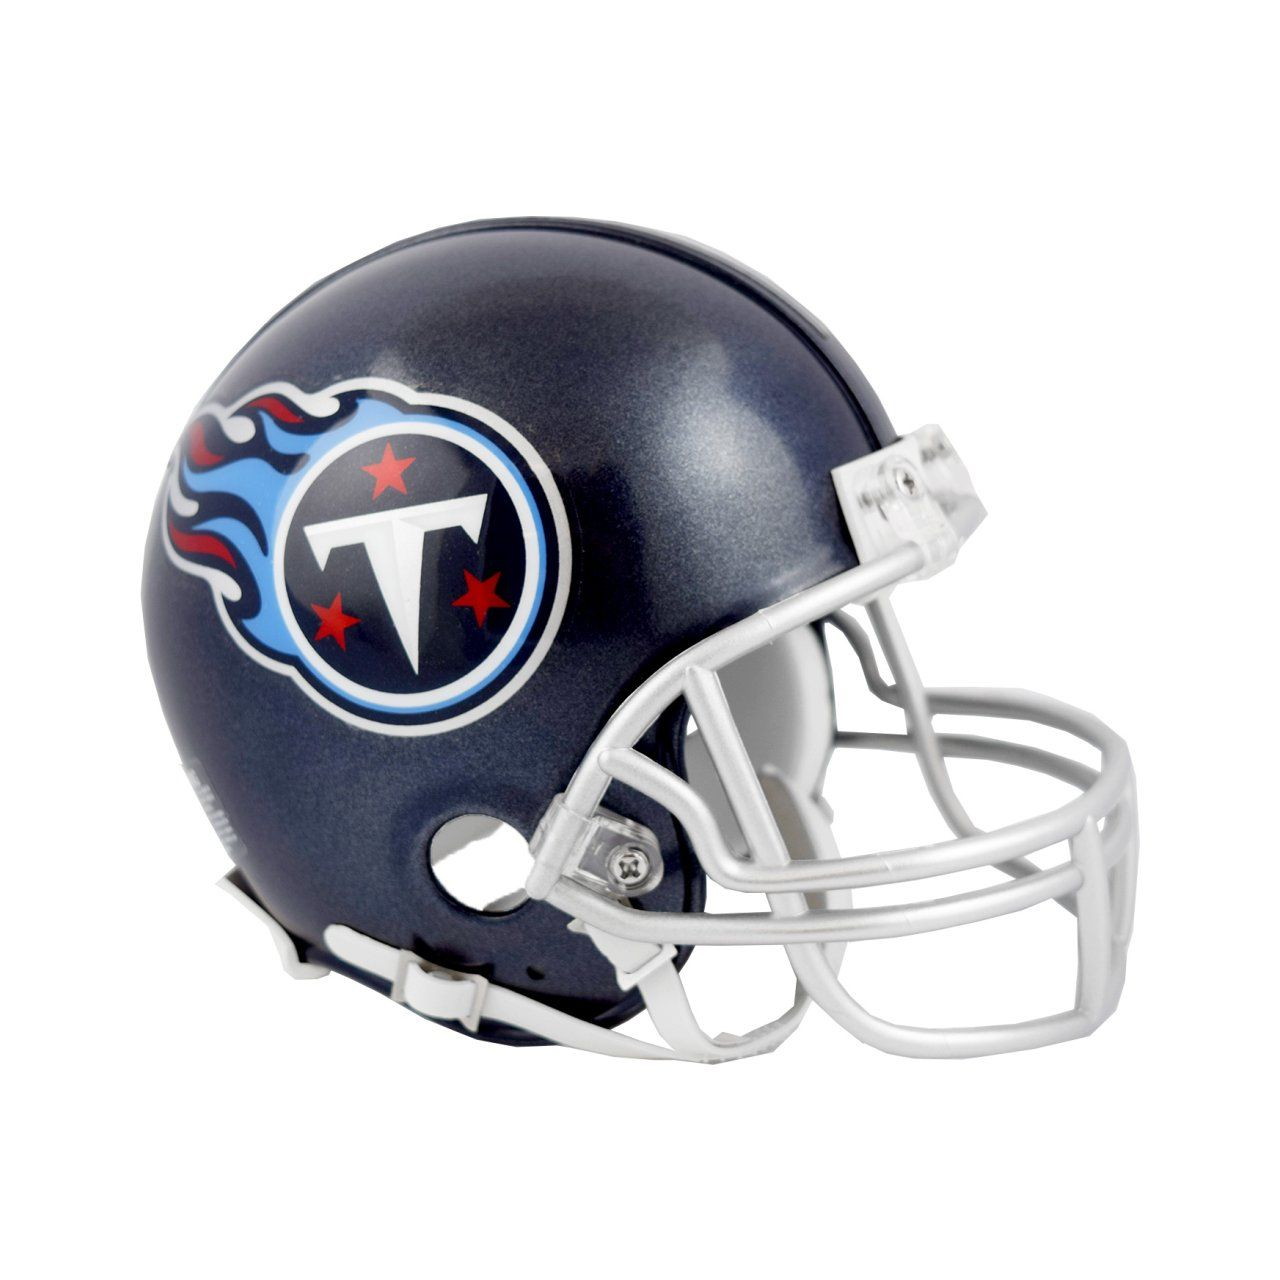 amfoo - Riddell VSR4 Mini Football Helm - NFL Tennessee Titans